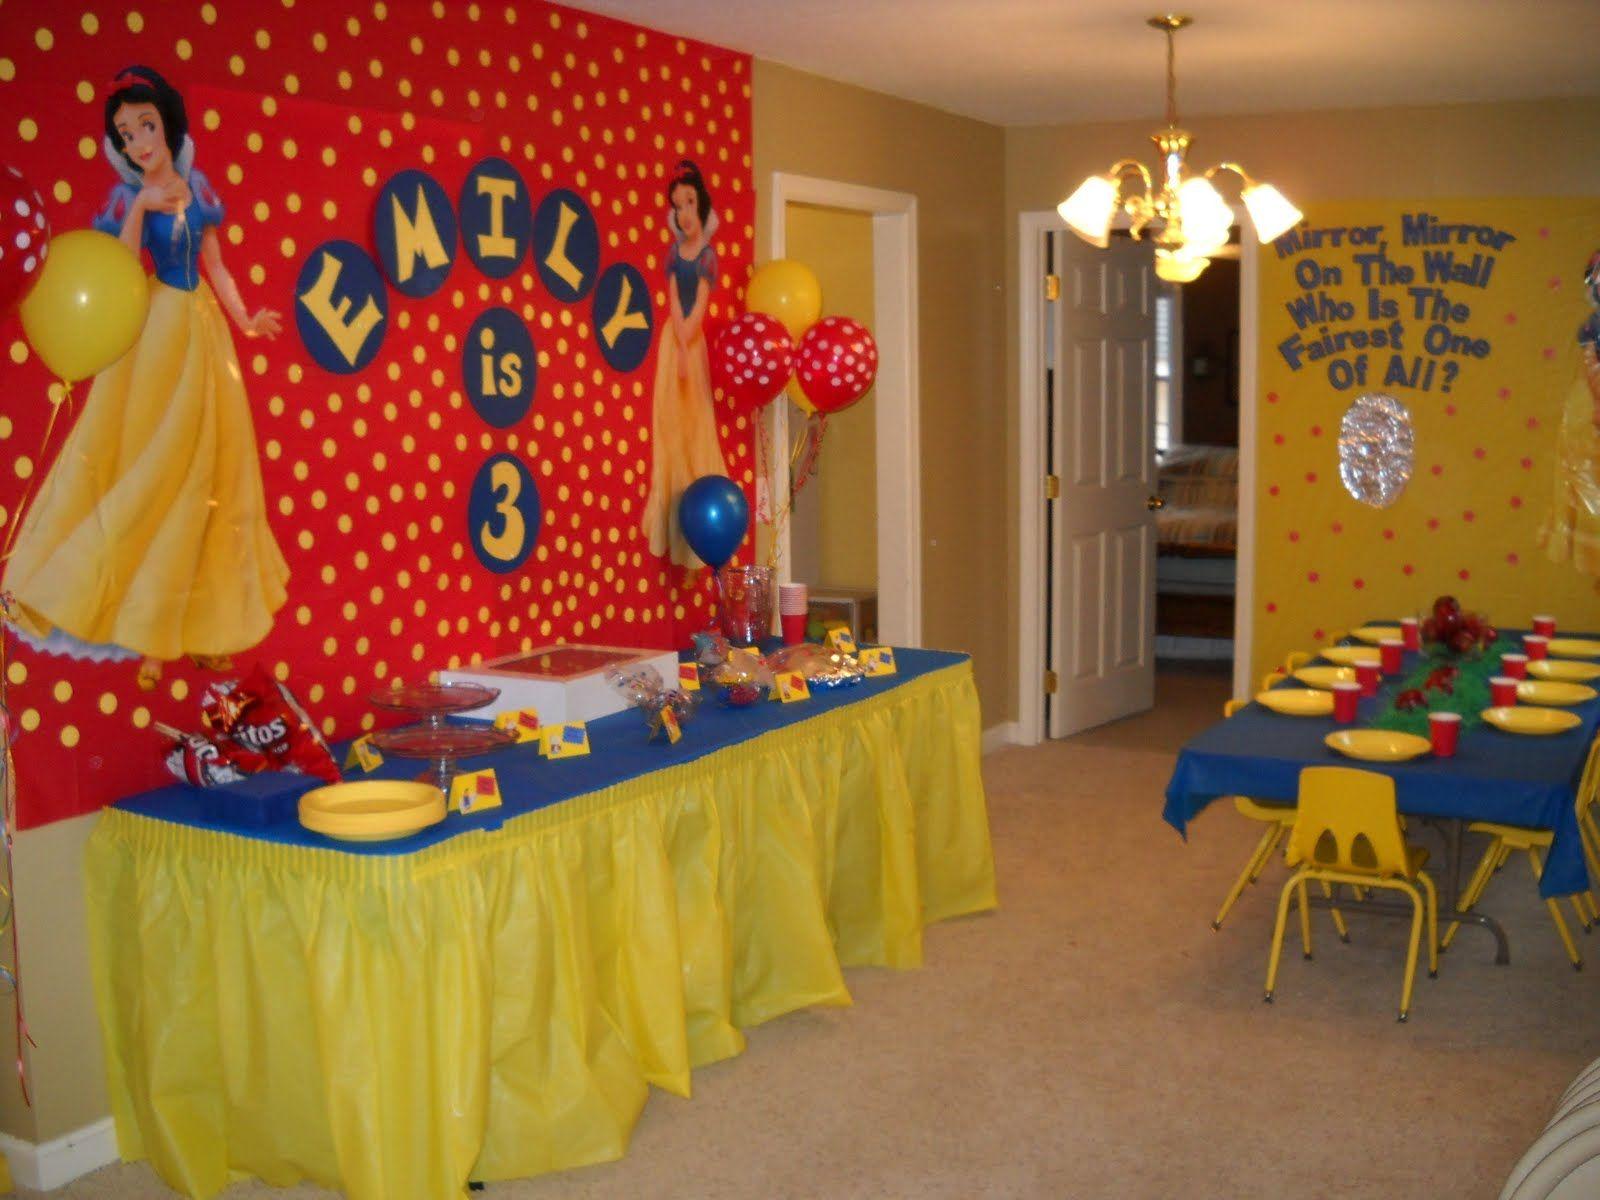 Snow White And The Seven Dwarfs Birthday Party Snow White Birthday Party Snow White Birthday Snow White Party